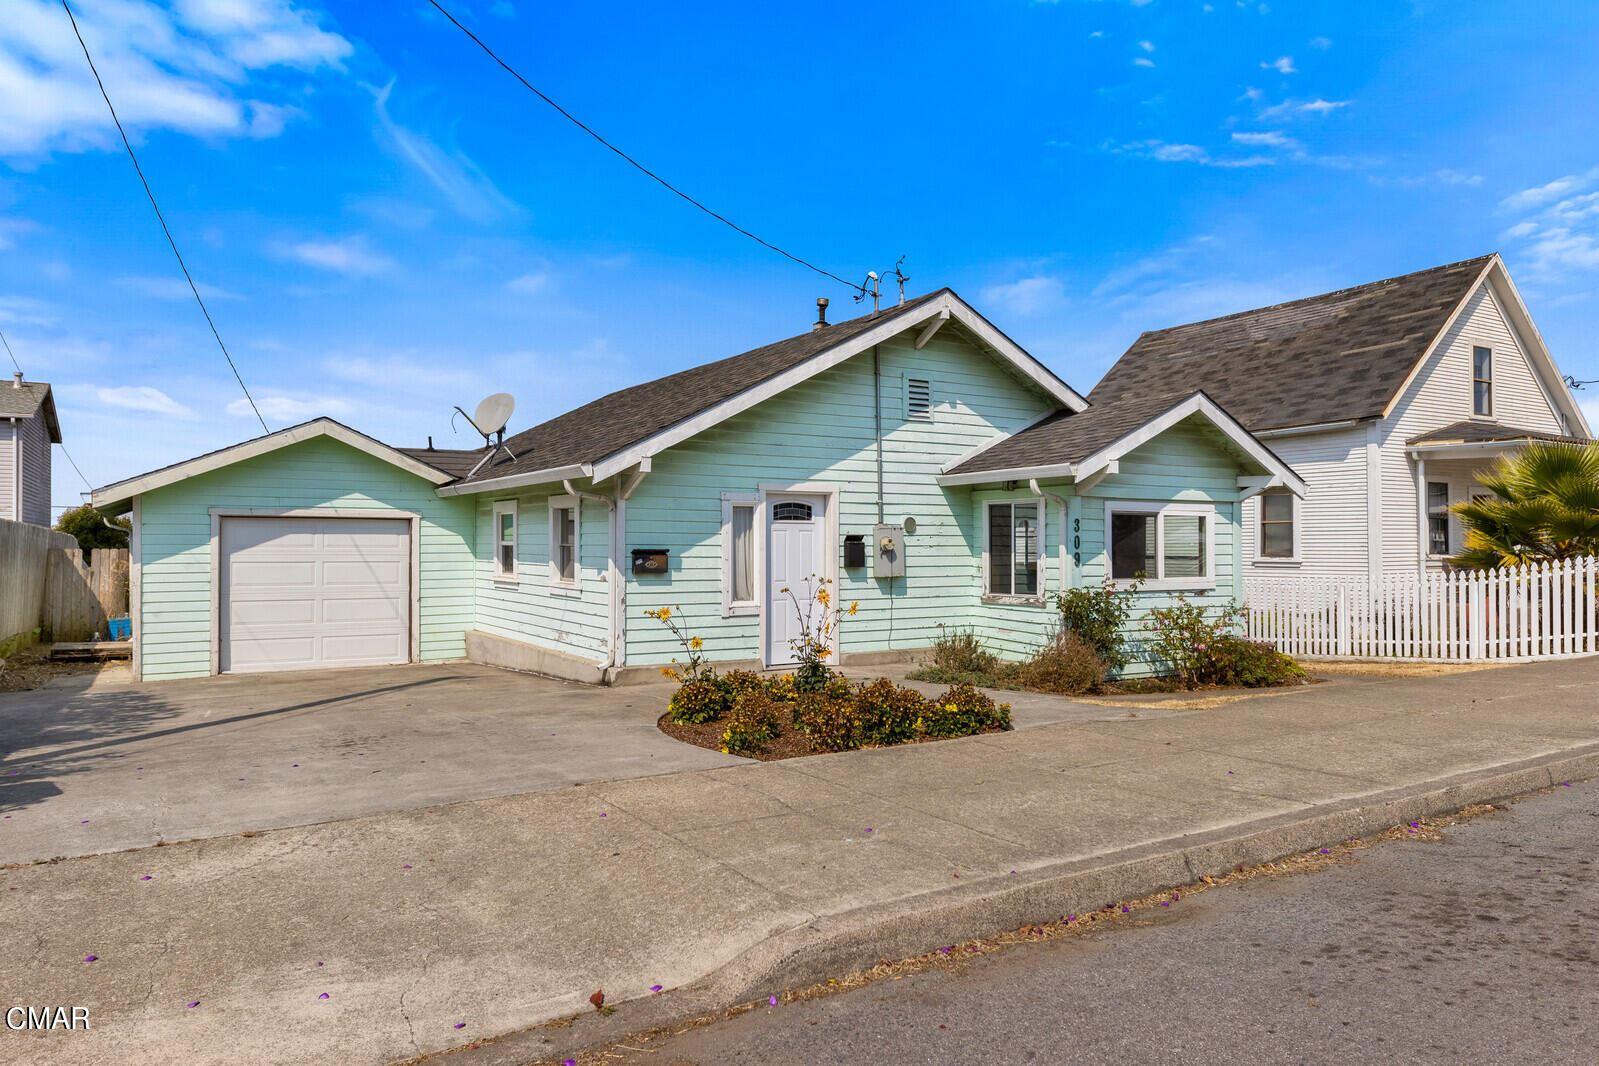 309 S Mcpherson Street, Fort Bragg, CA 95437 - MLS#: 27991